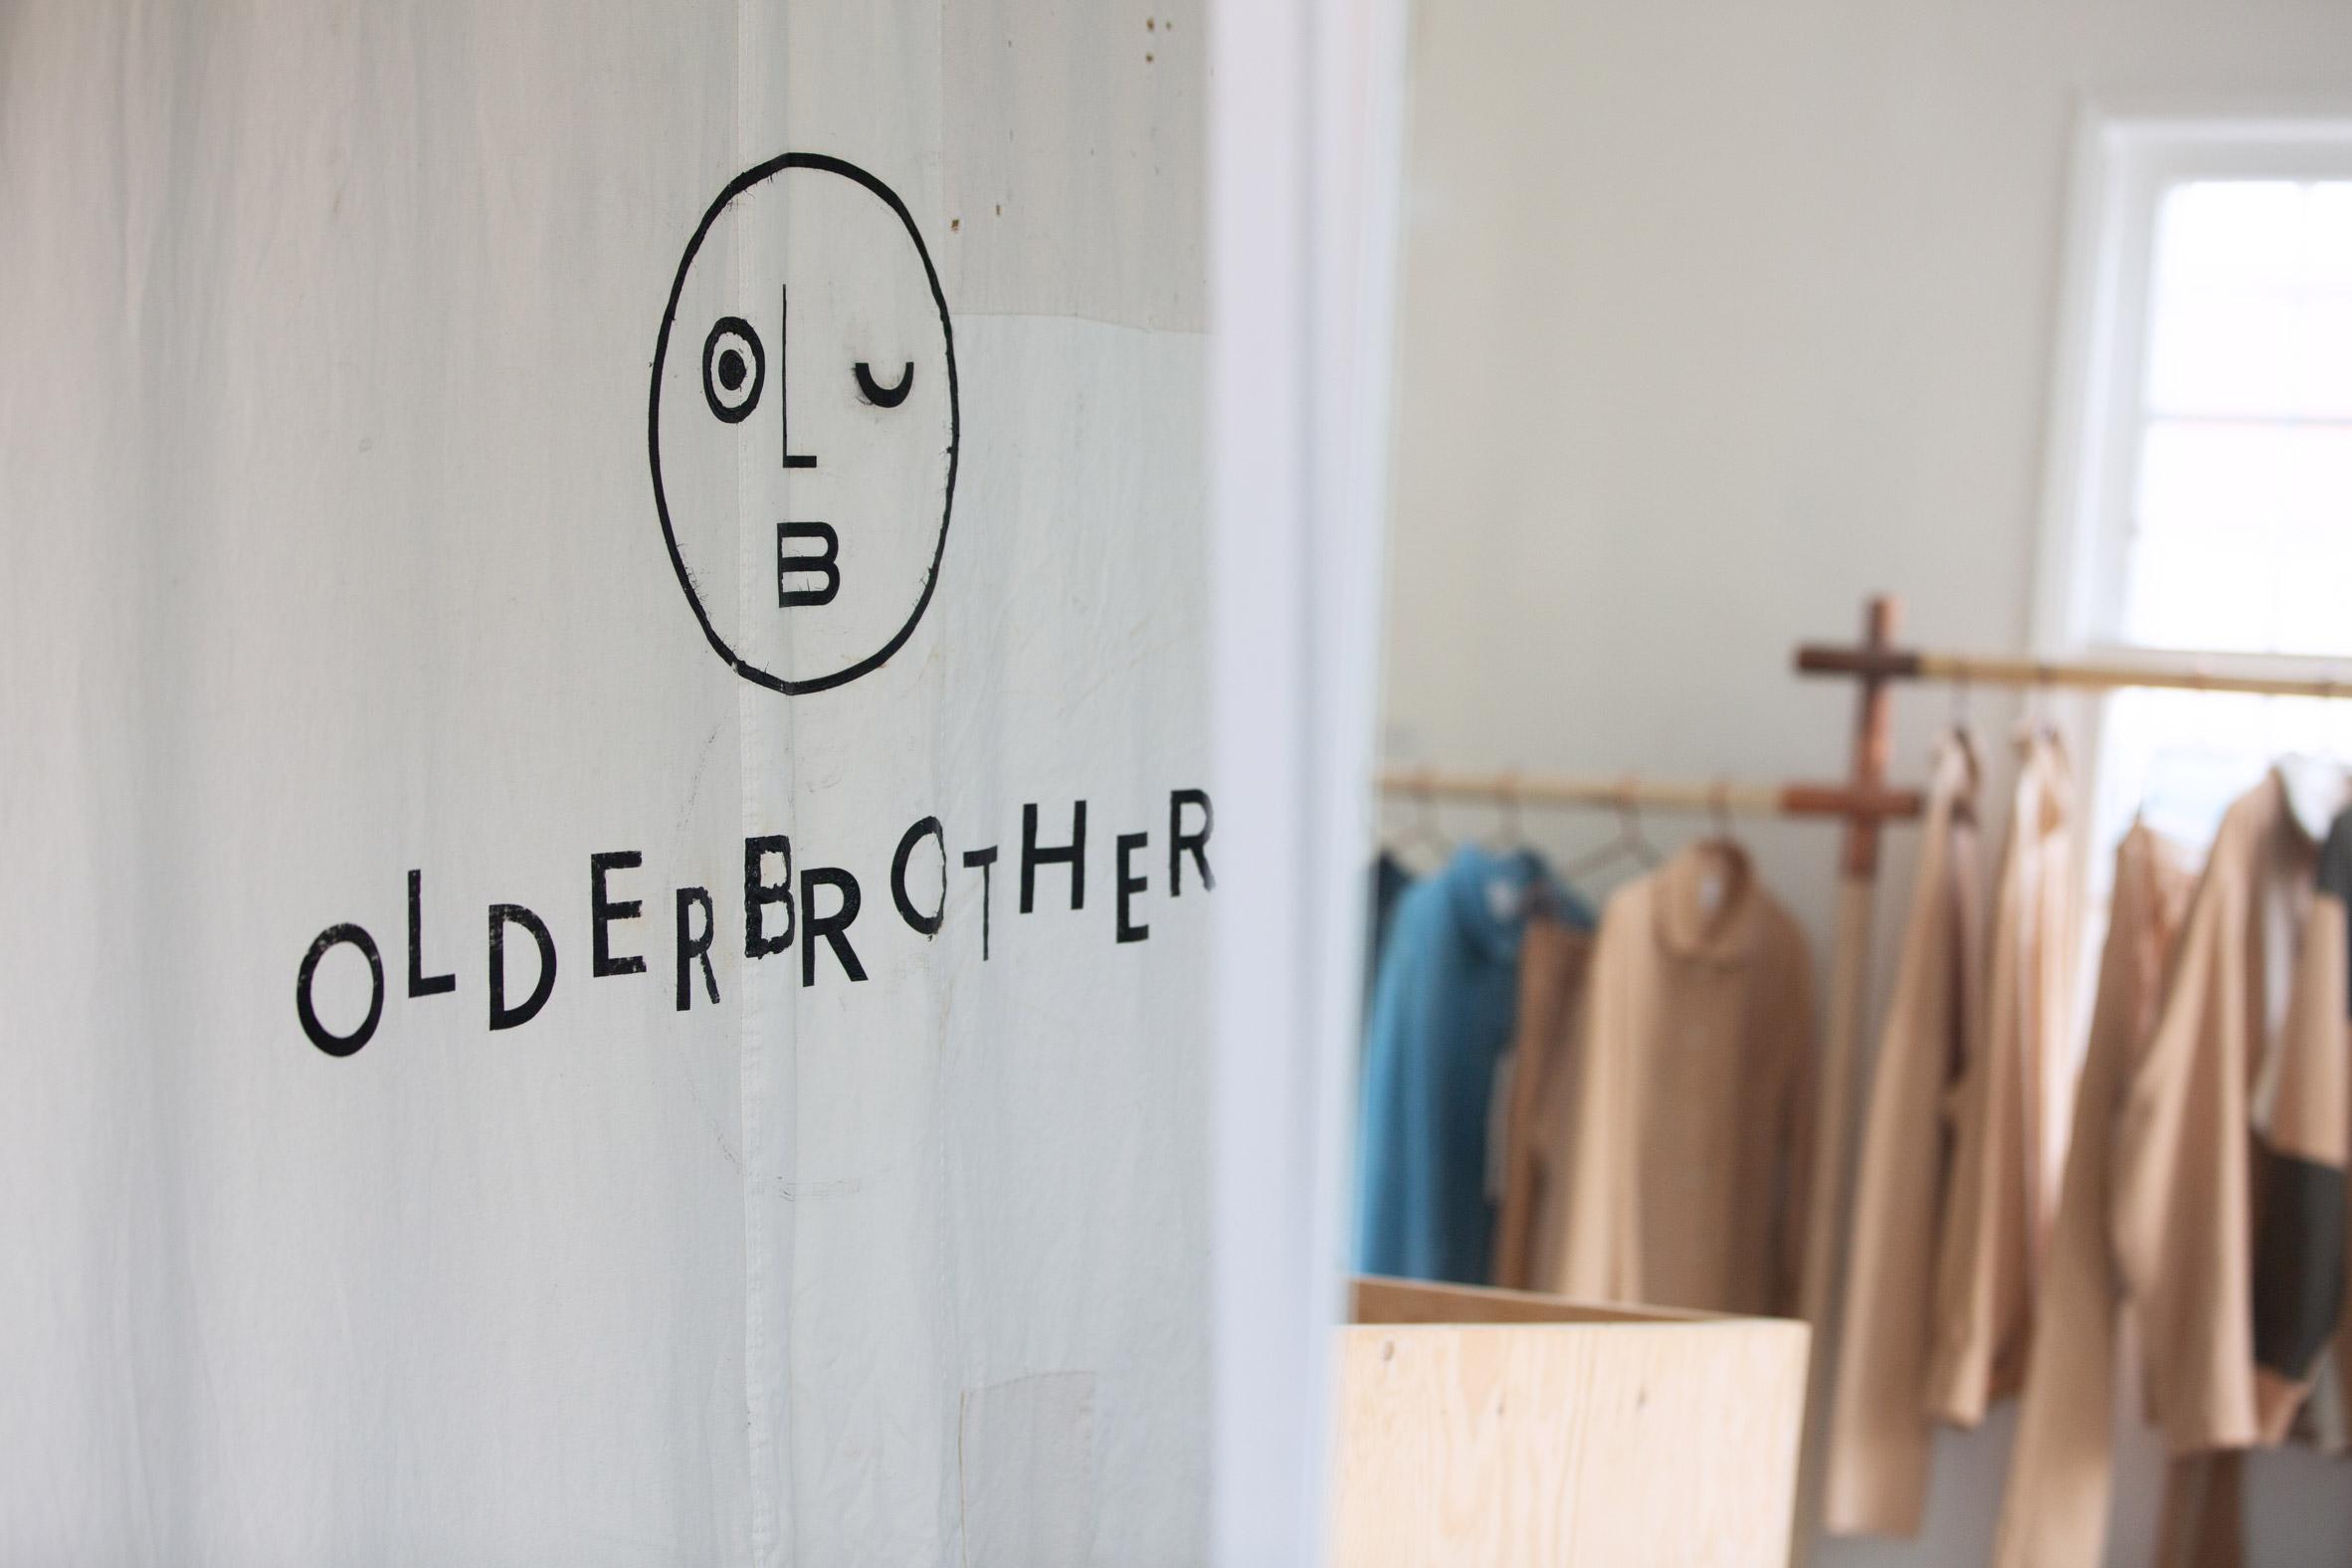 olderbrother-interiors-retail-los-angeles-california-usa.jpg